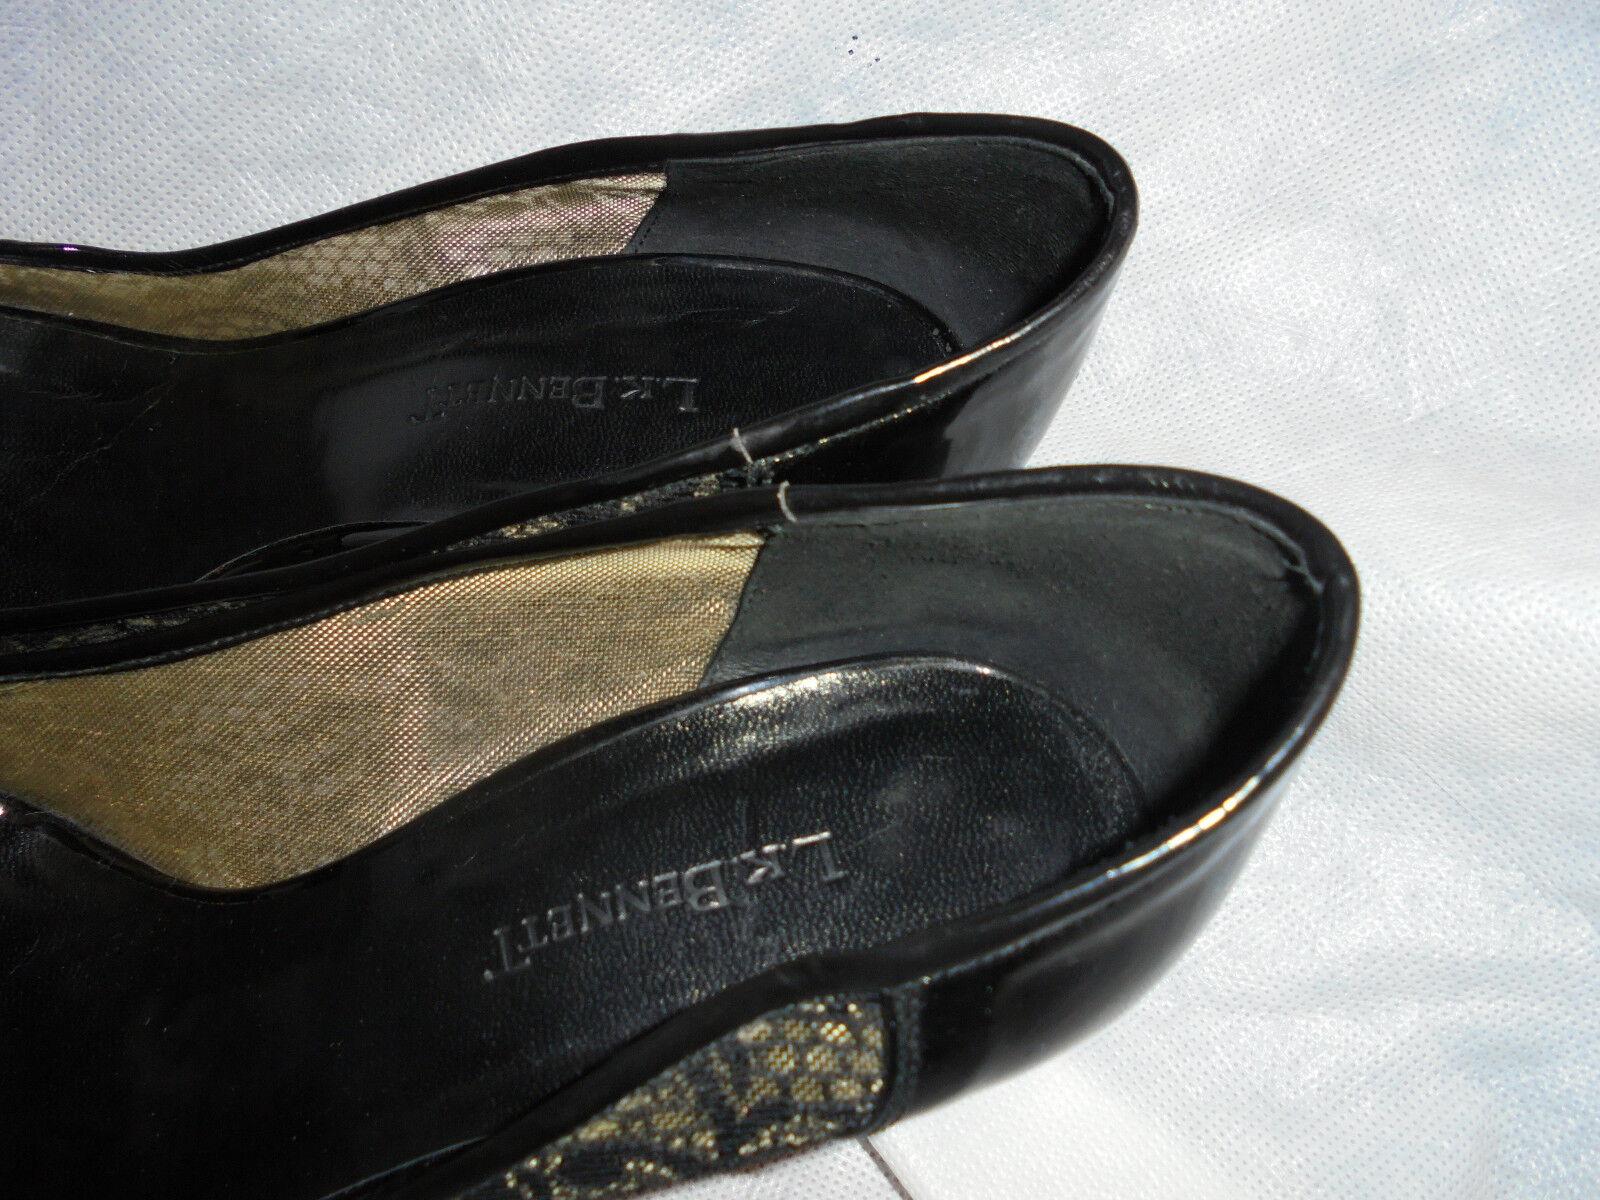 LK BENNETH WOMEN BLACK TOE LEATHER/TEXTILE SLIP ON PEEP TOE BLACK SHOE SIZE UK 6 EU 39 VGC fab9fb